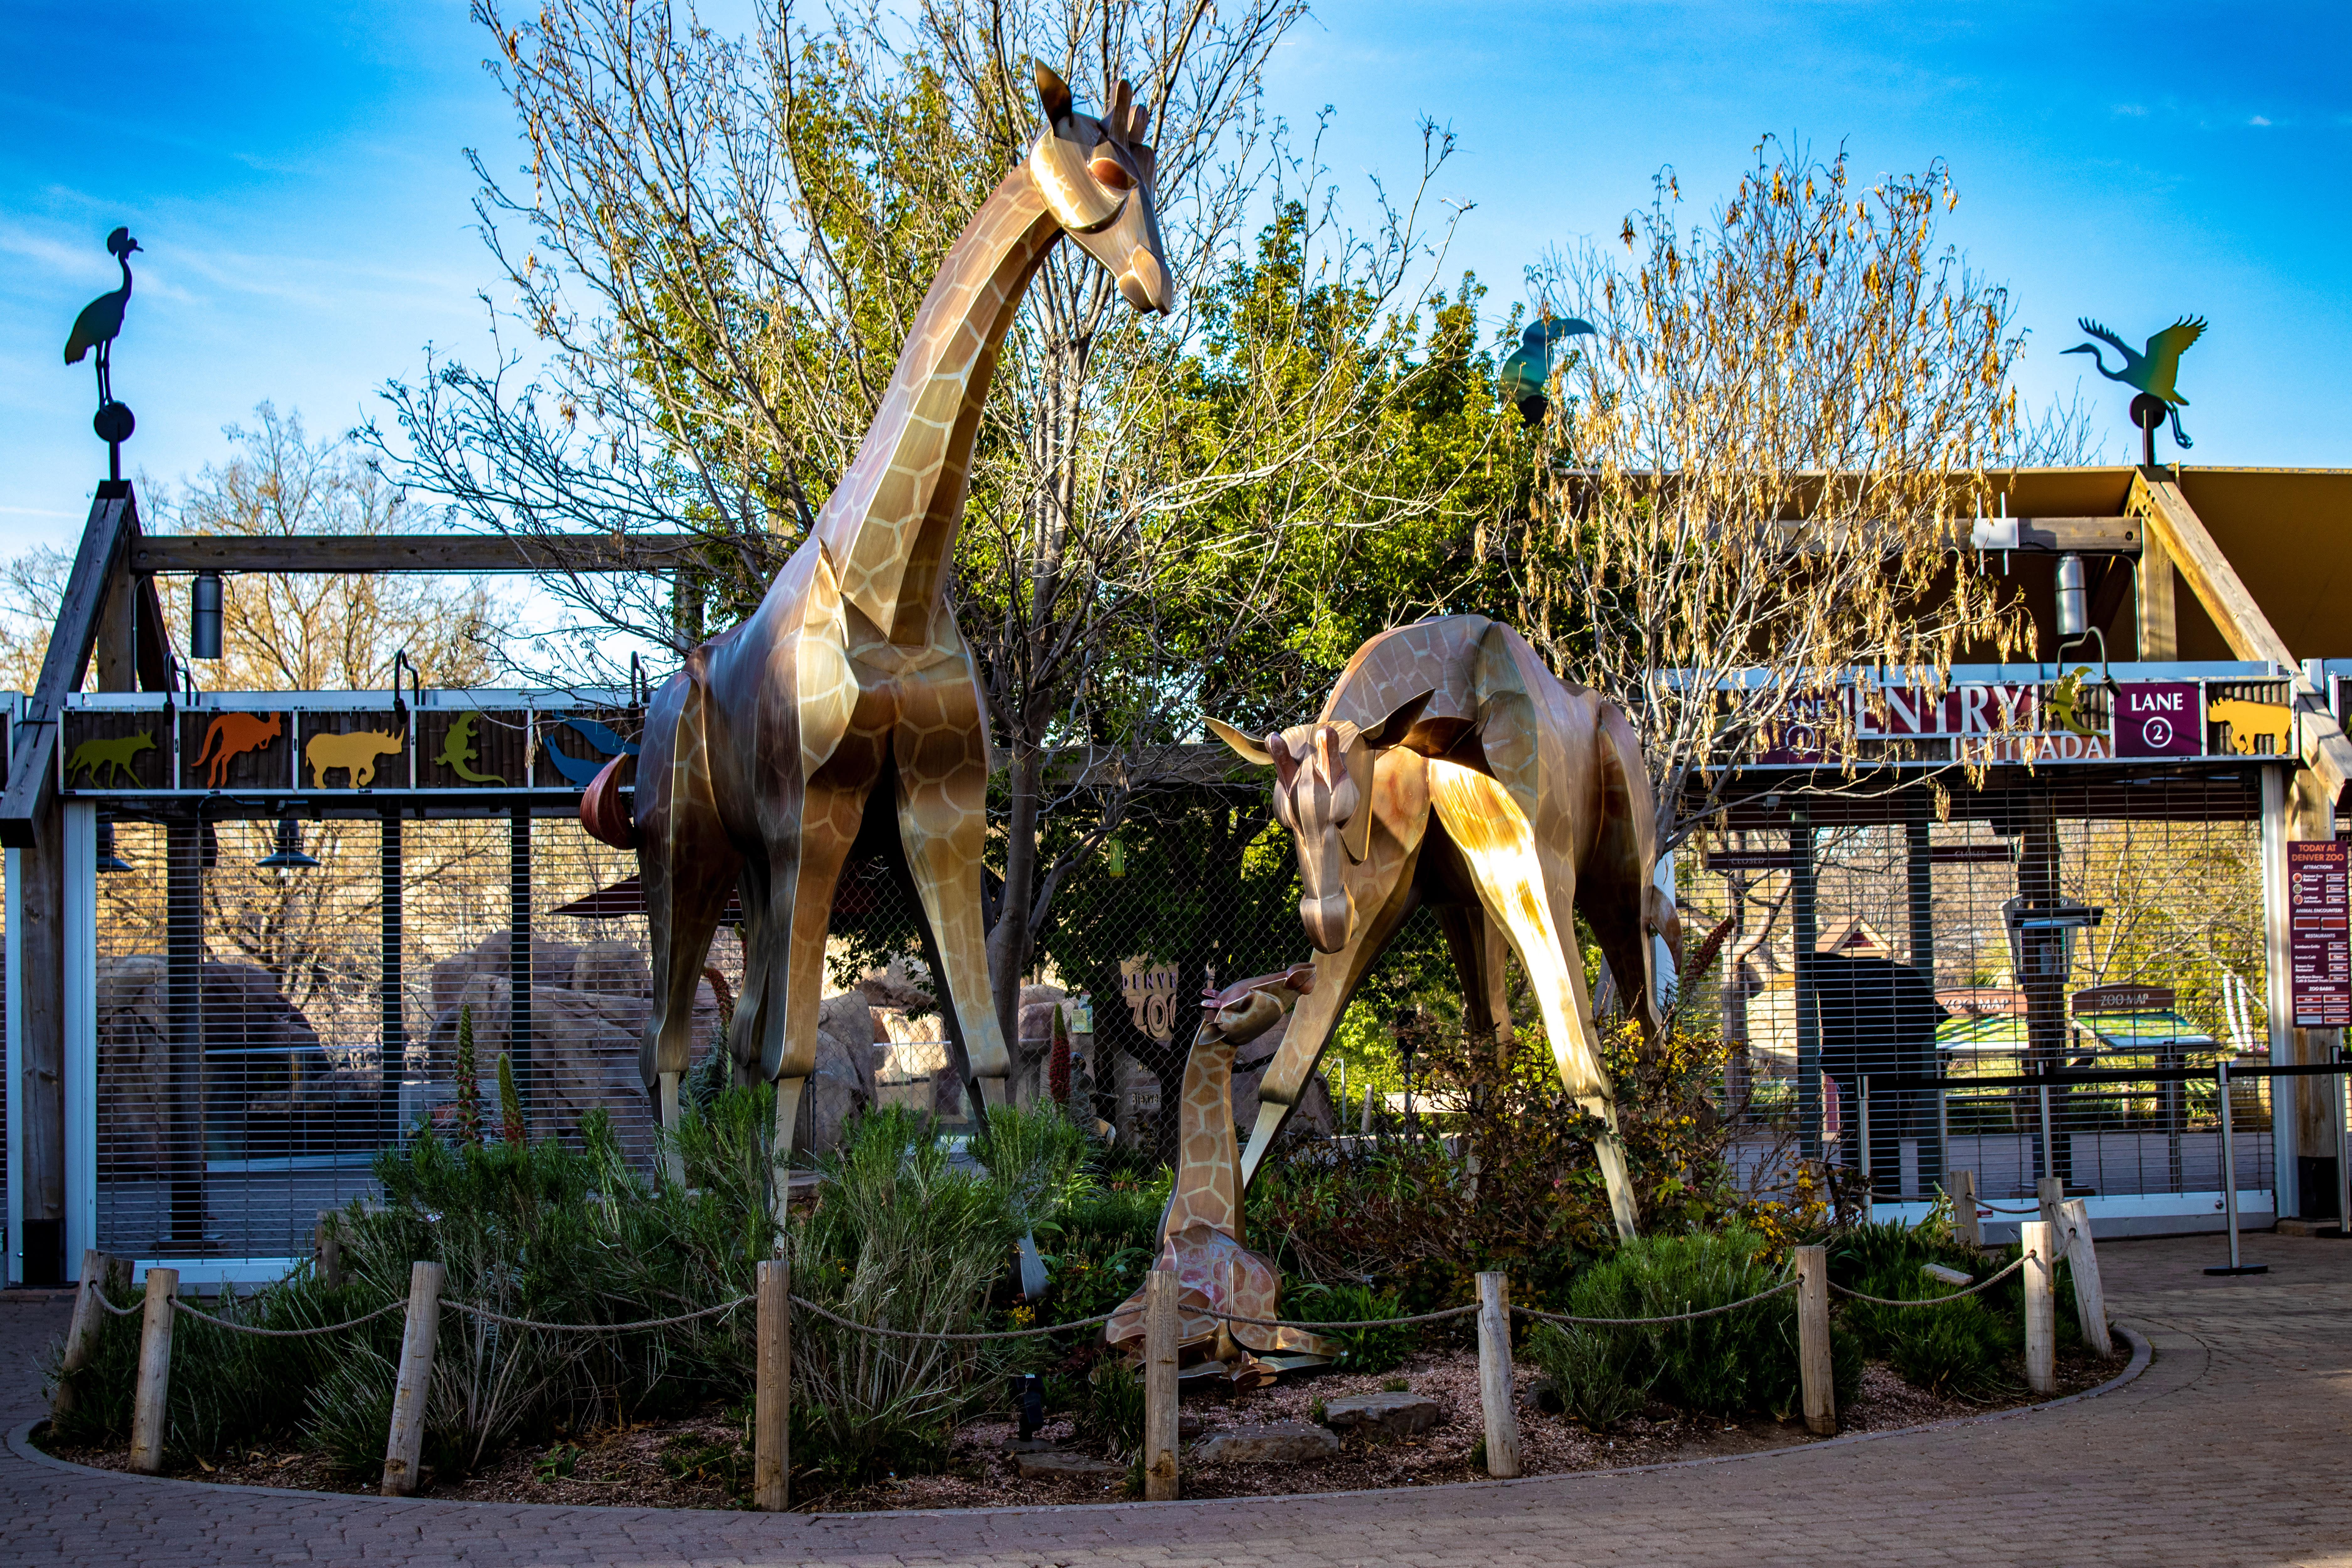 denver zoo tickets online